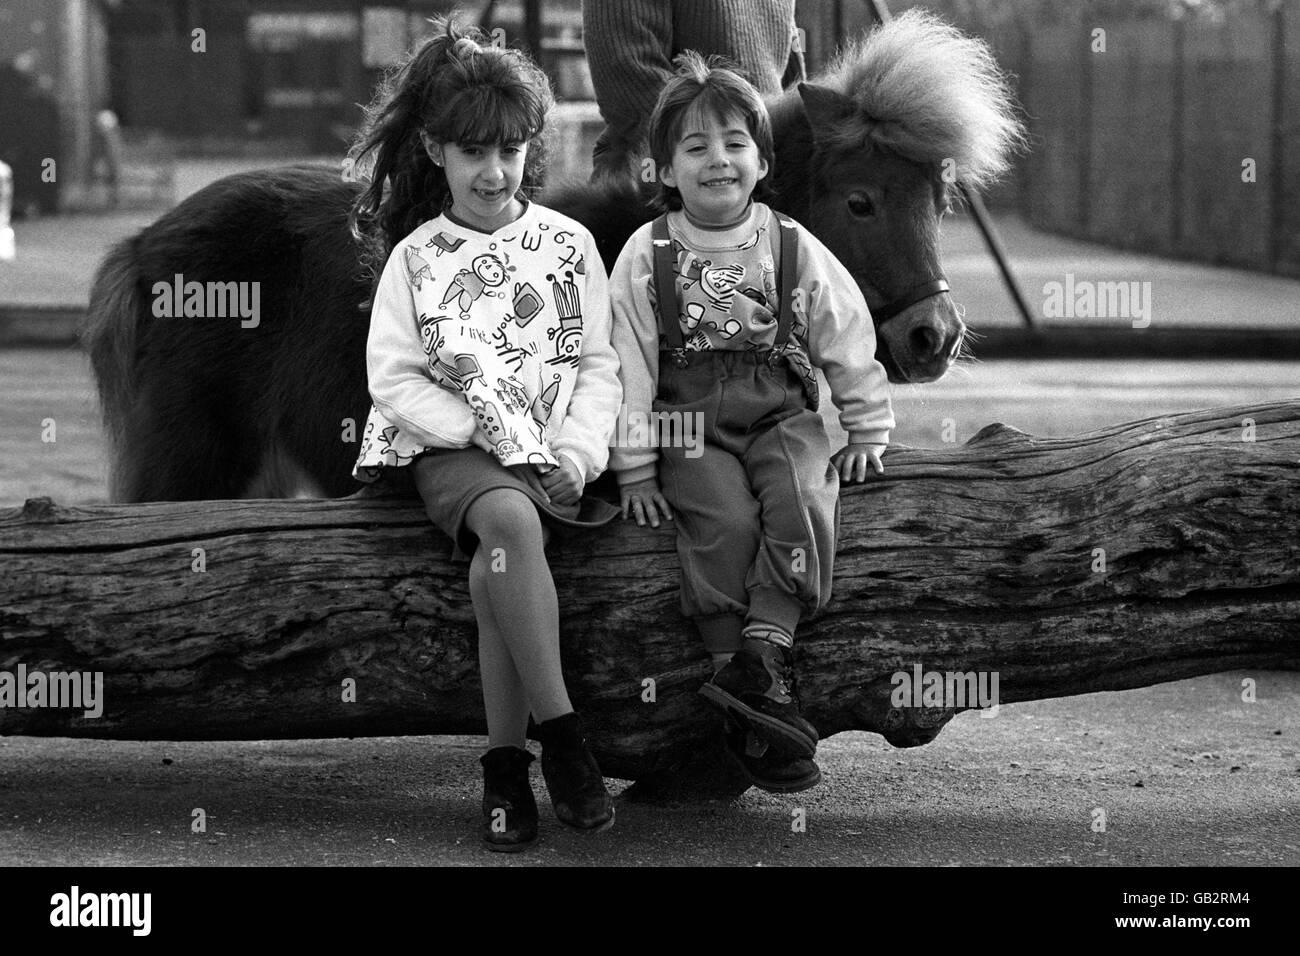 Bobo Childrenswear - London Zoo - 1990 Stock Photo